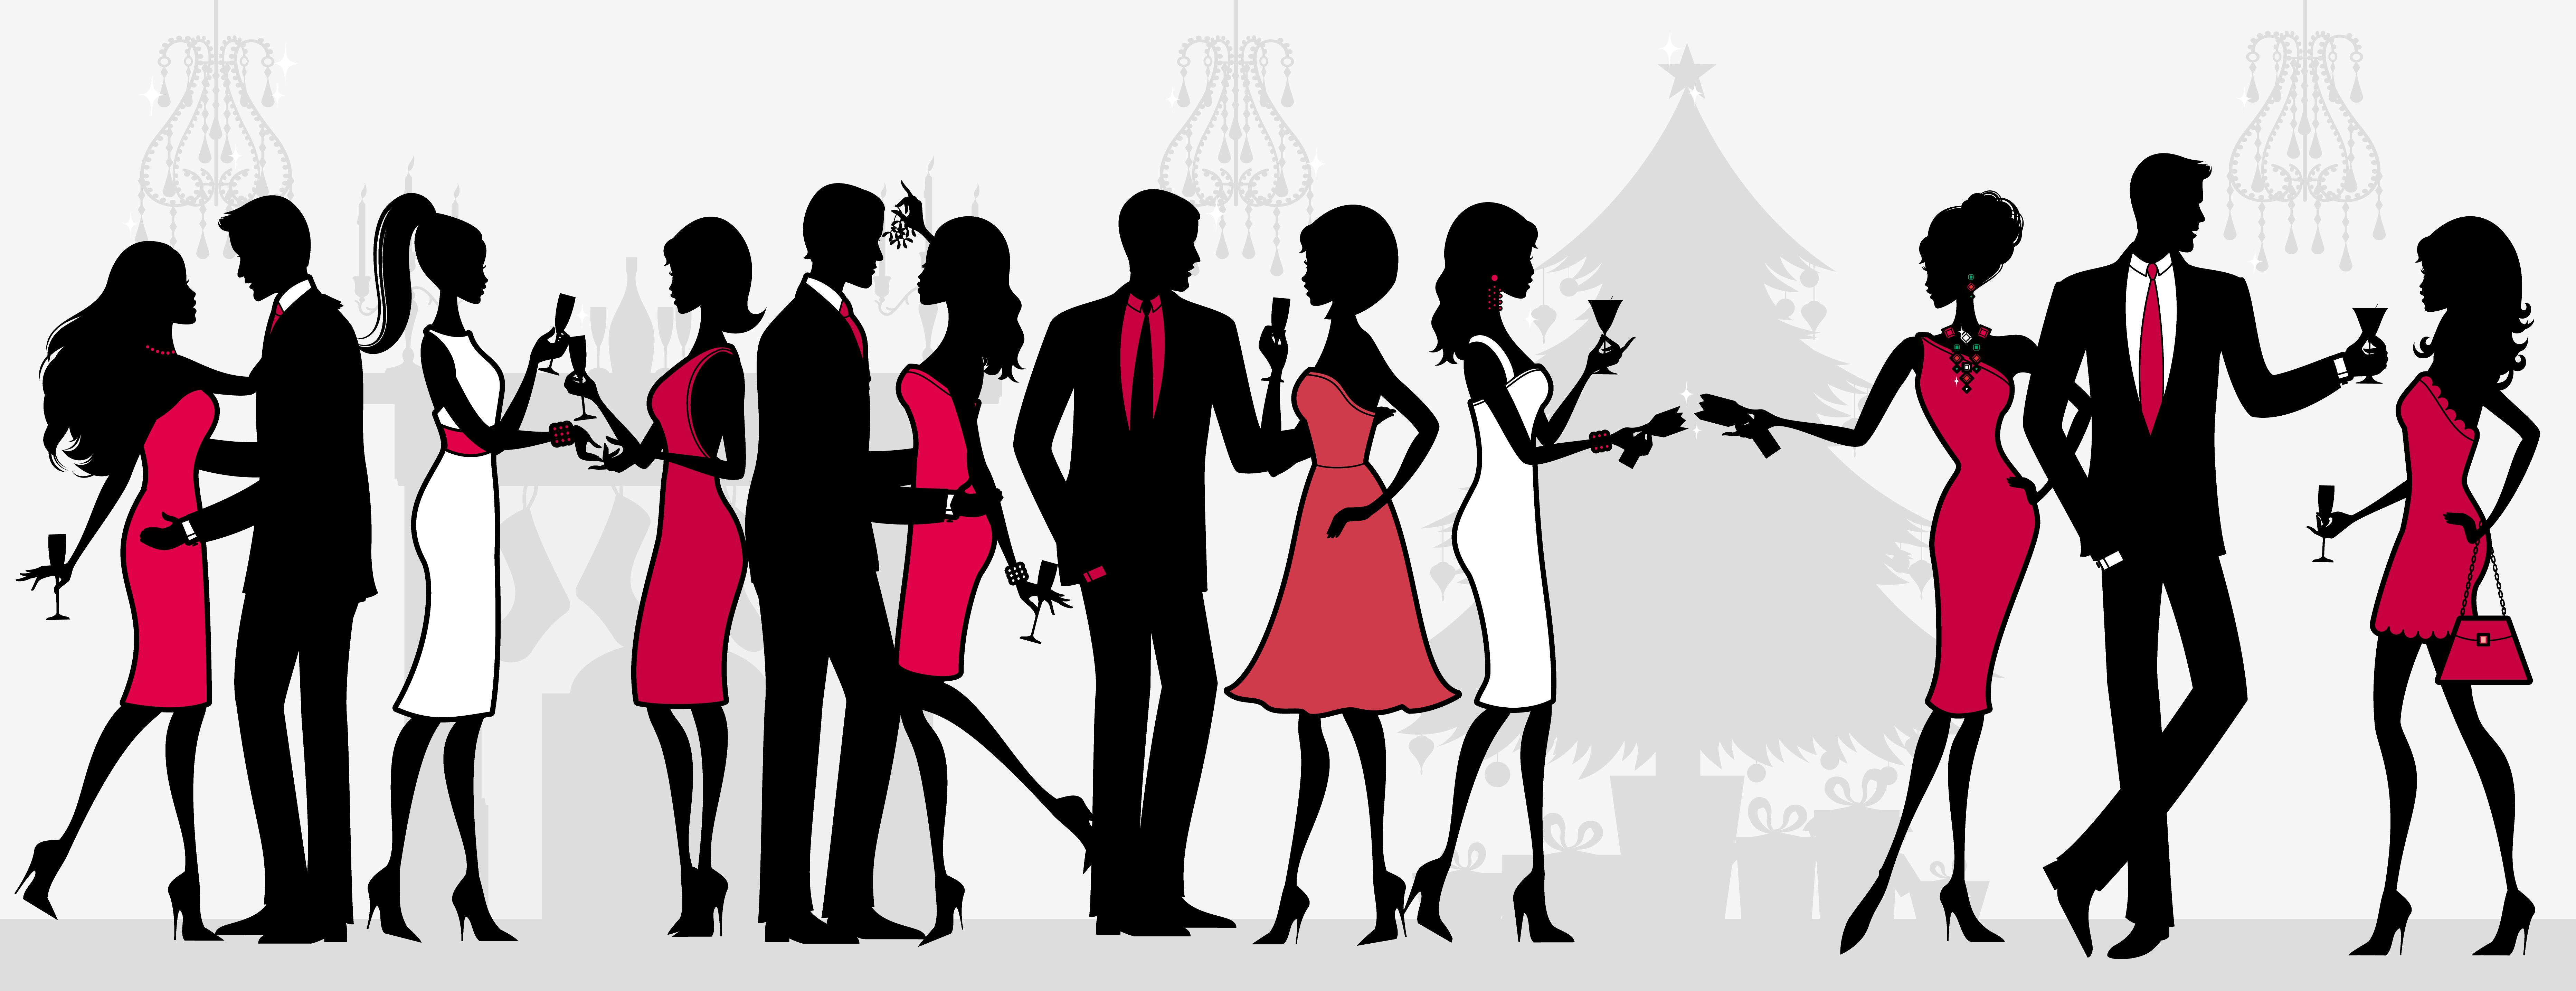 Party (Guest Blog)